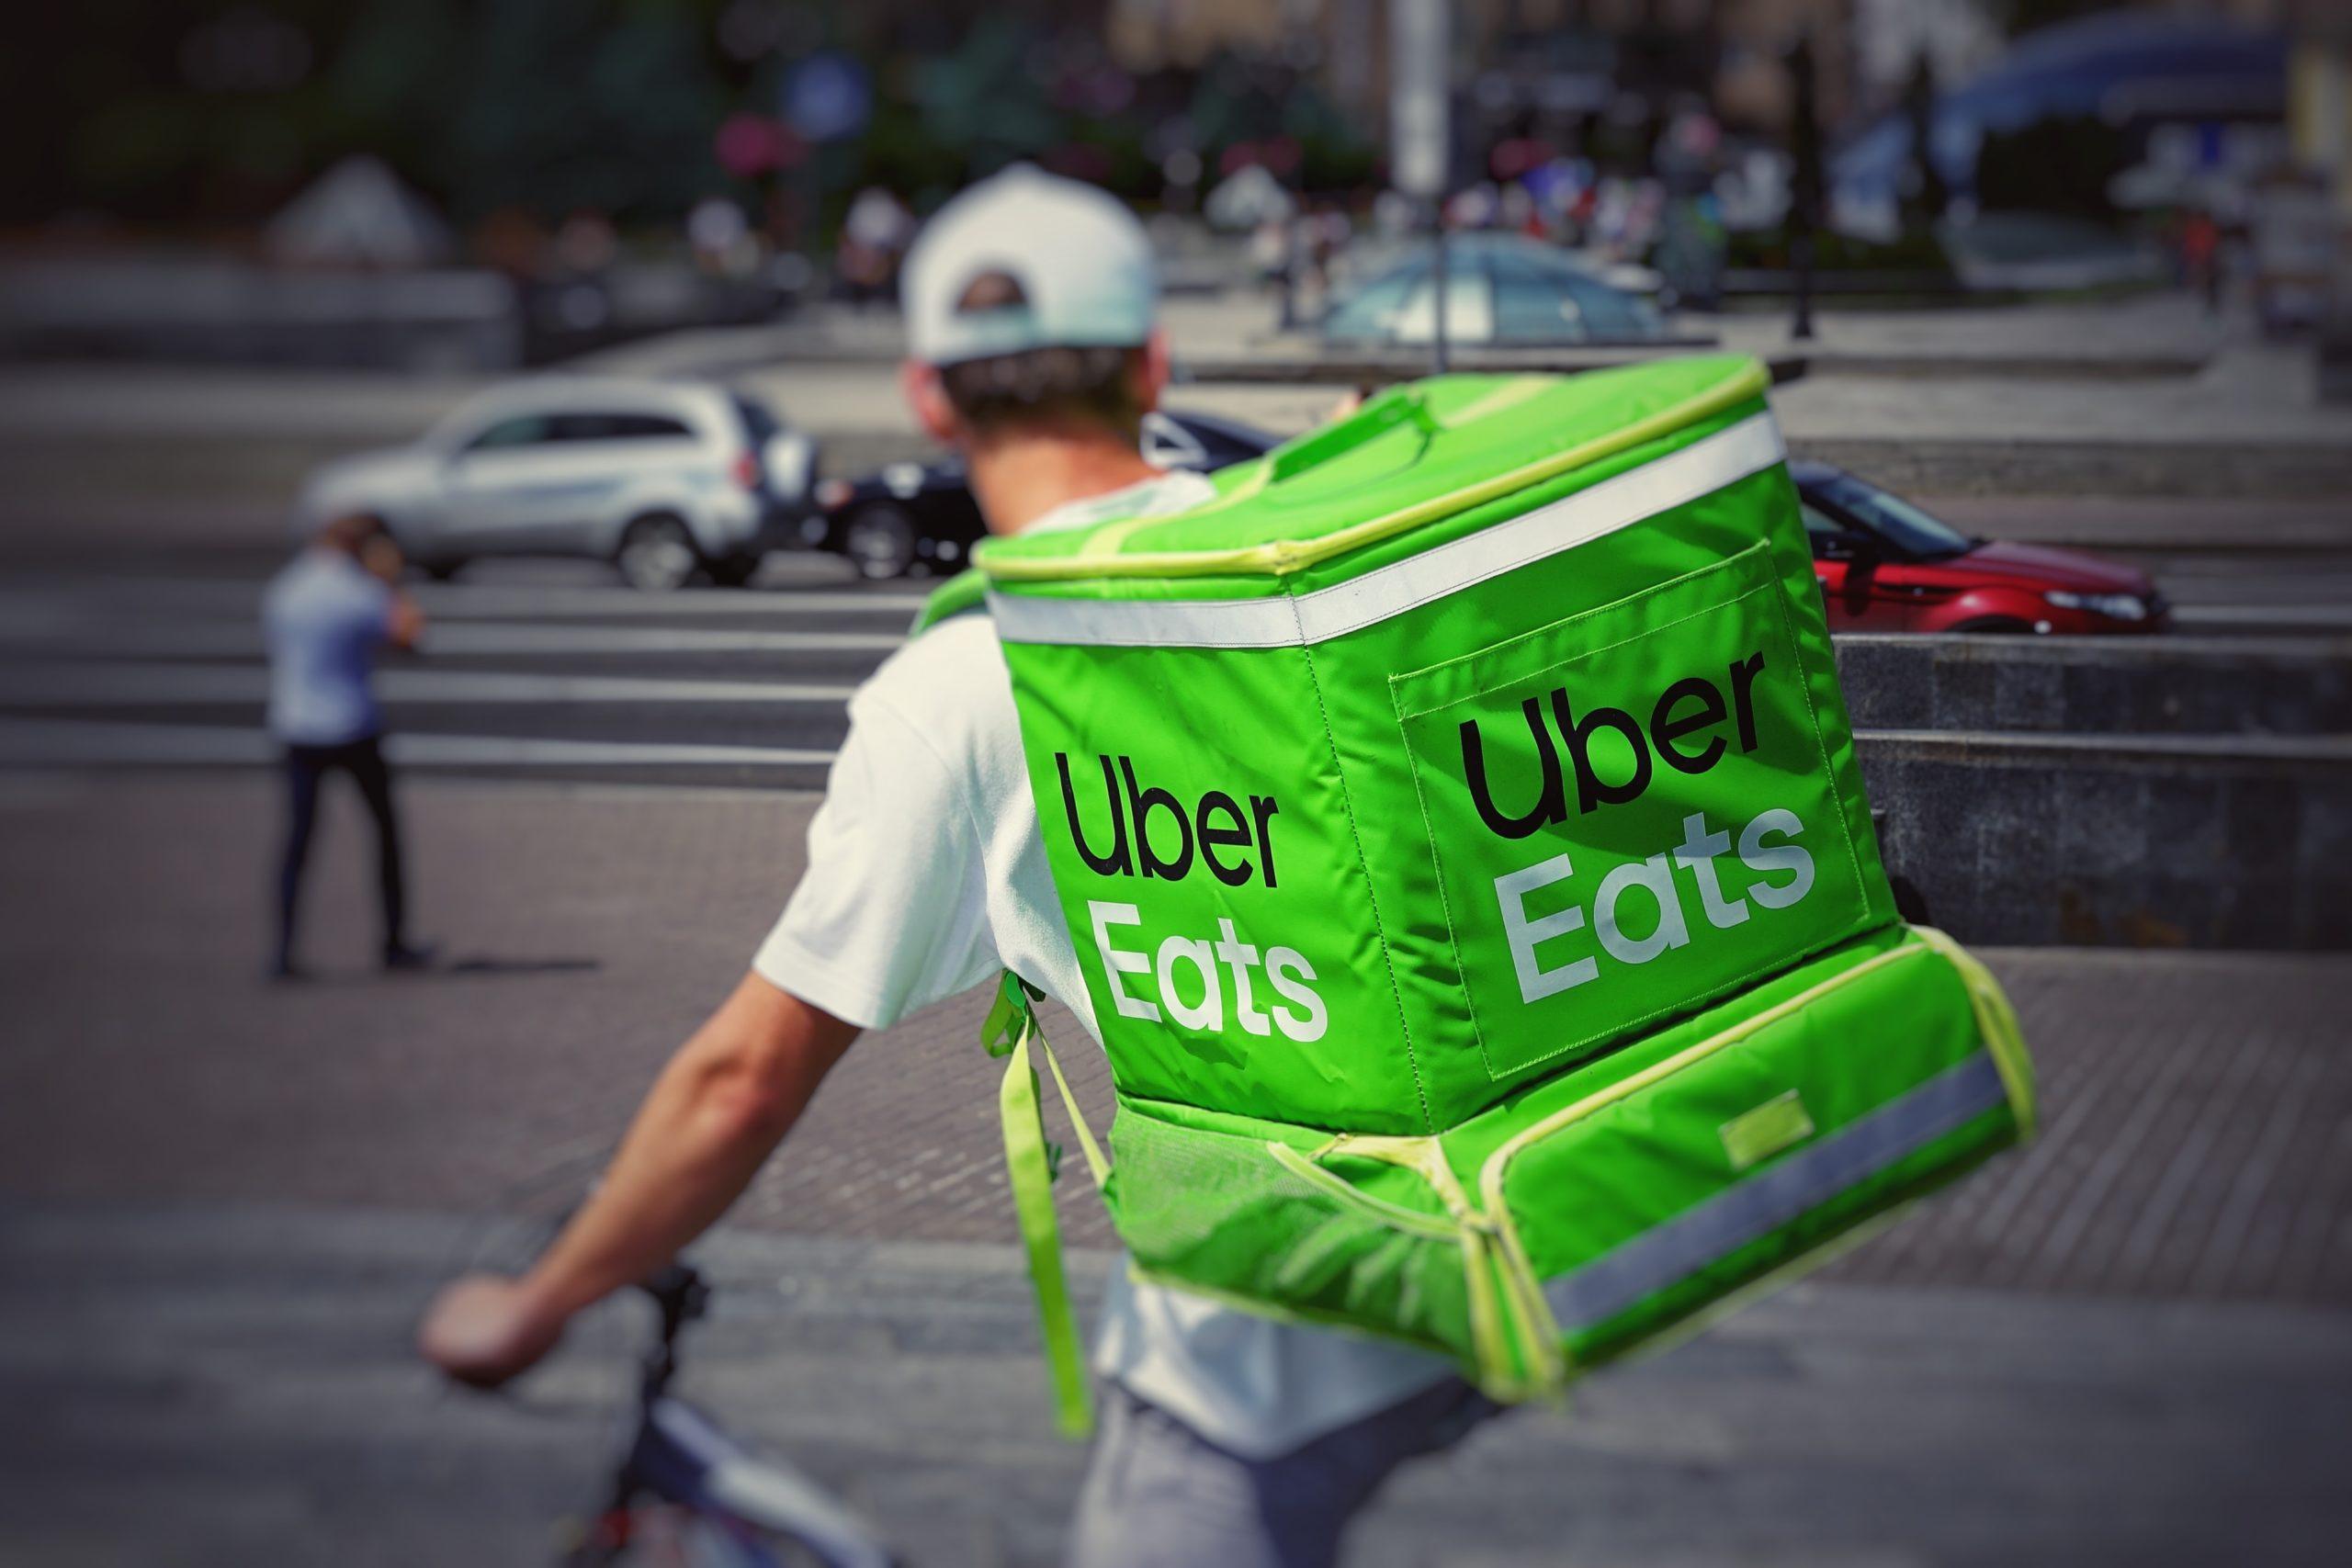 Uber deve adquirir Drizly por US$ 1,1 bilhão